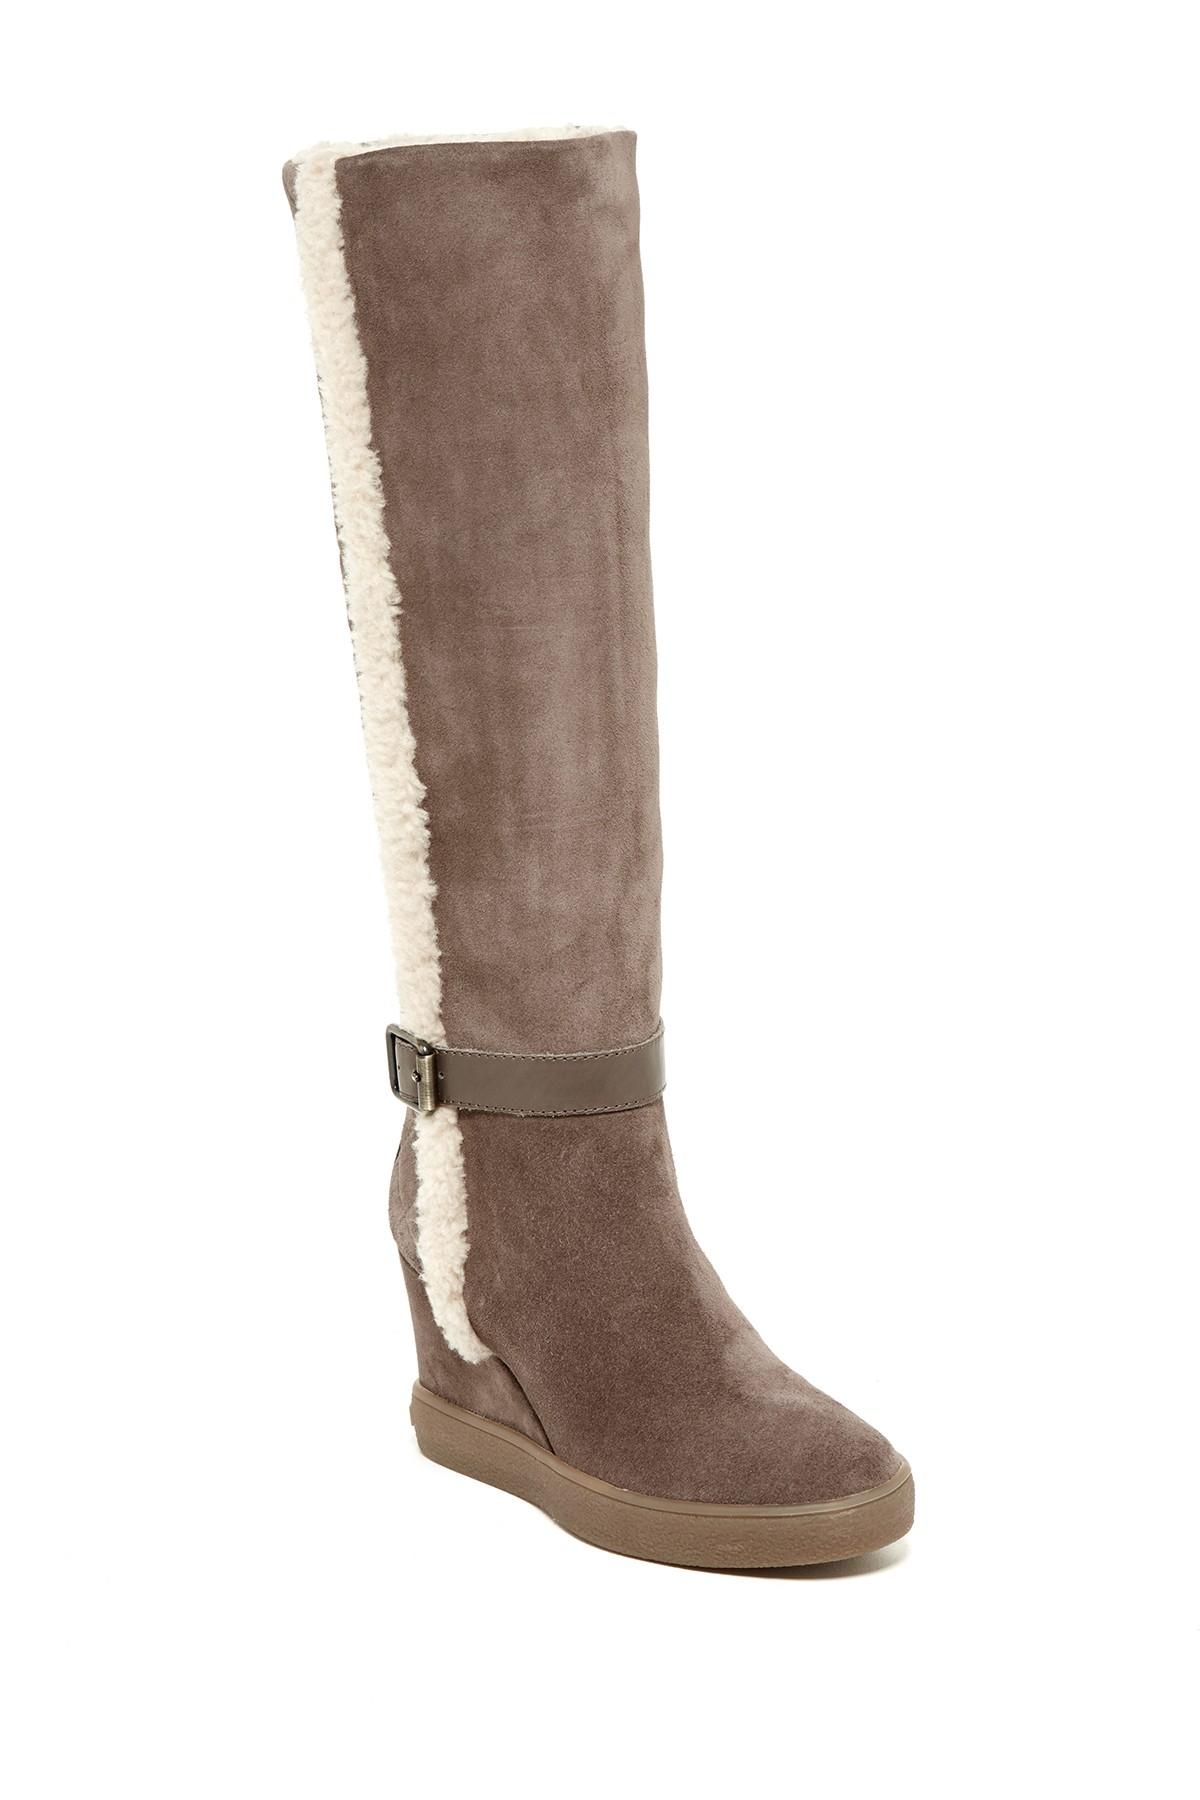 Aquatalia Callie Faux Fur Trim Boot in Brown